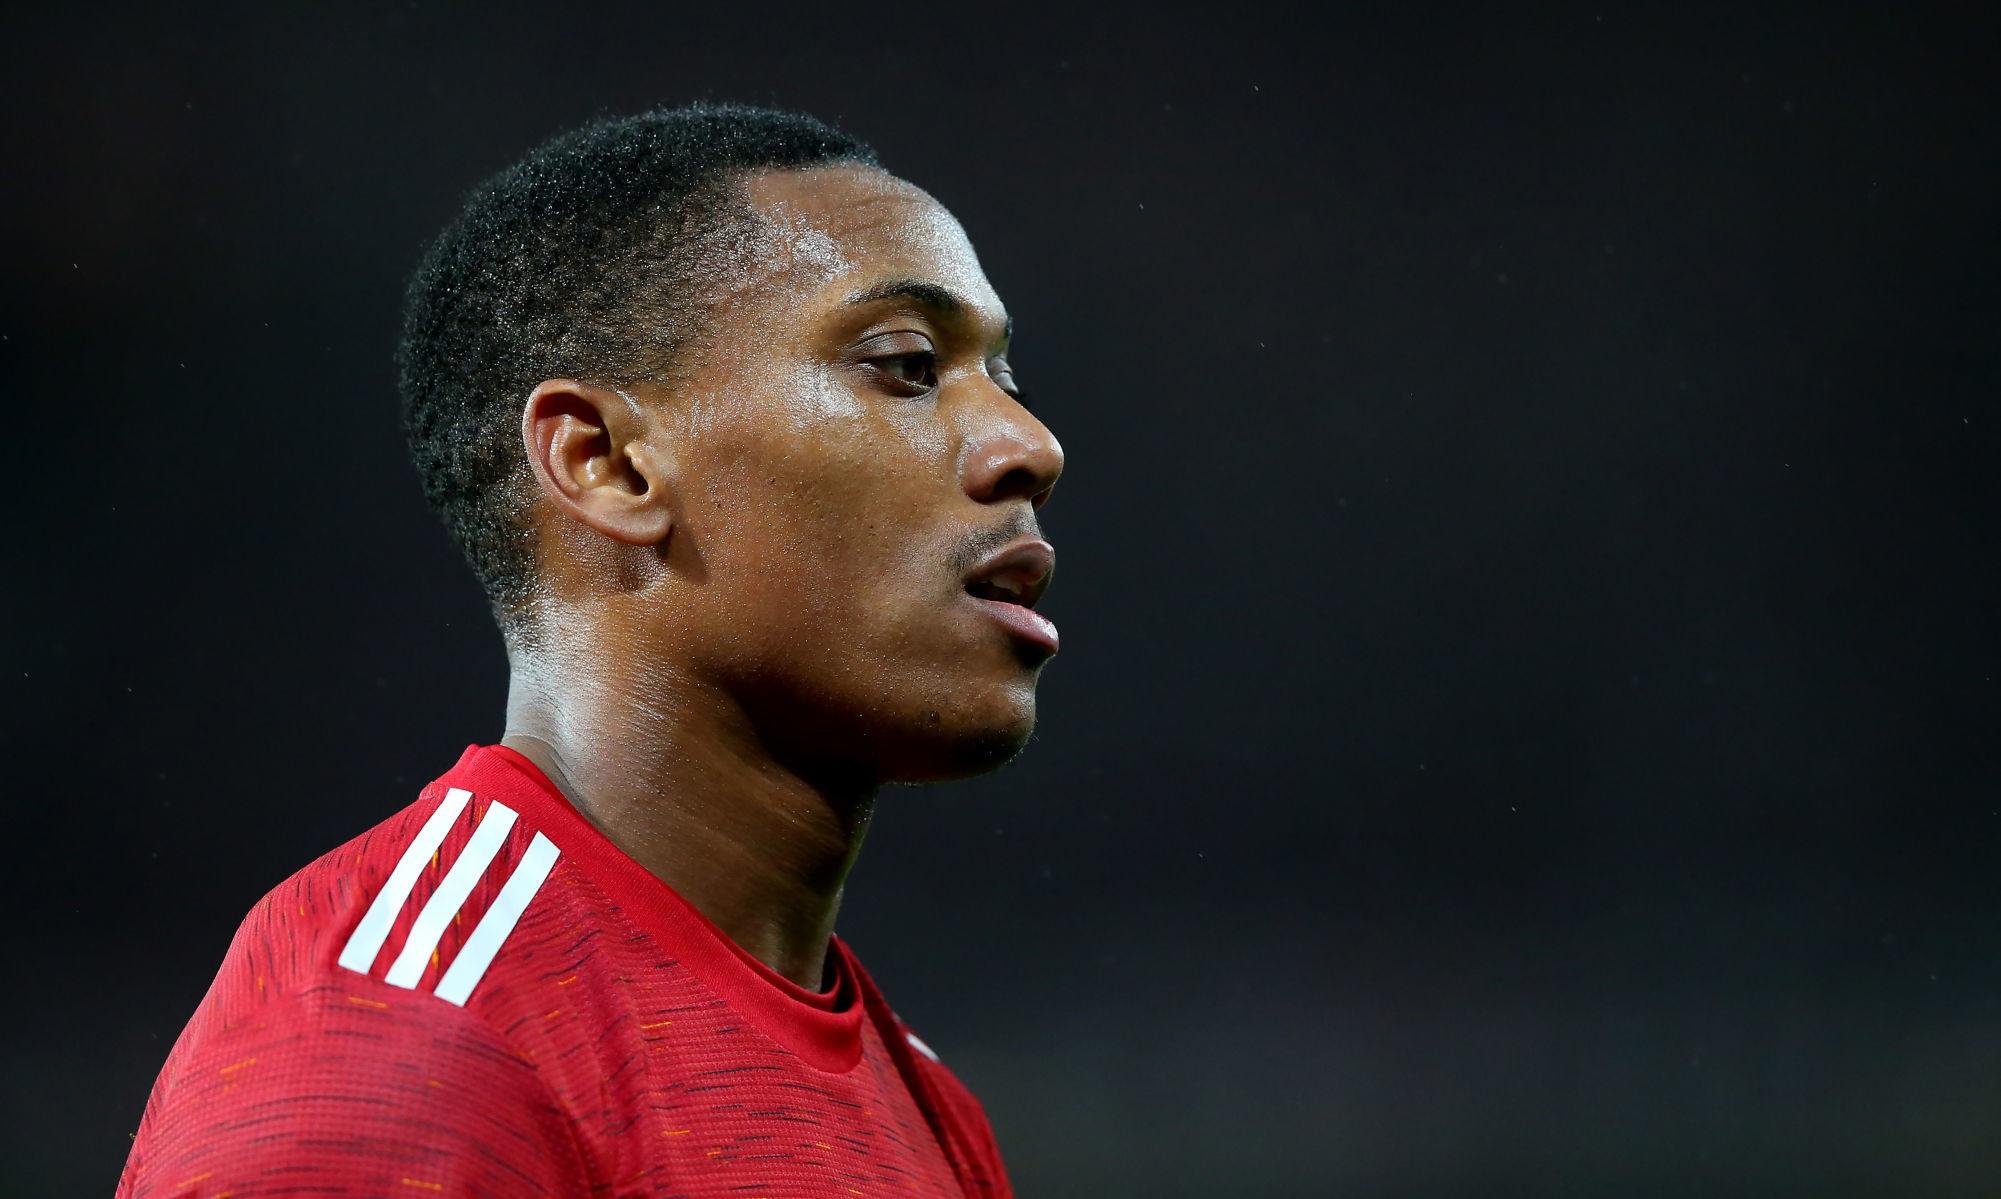 Manchester United/PSG - Martial n'a pas pu s'entraîner ce lundi